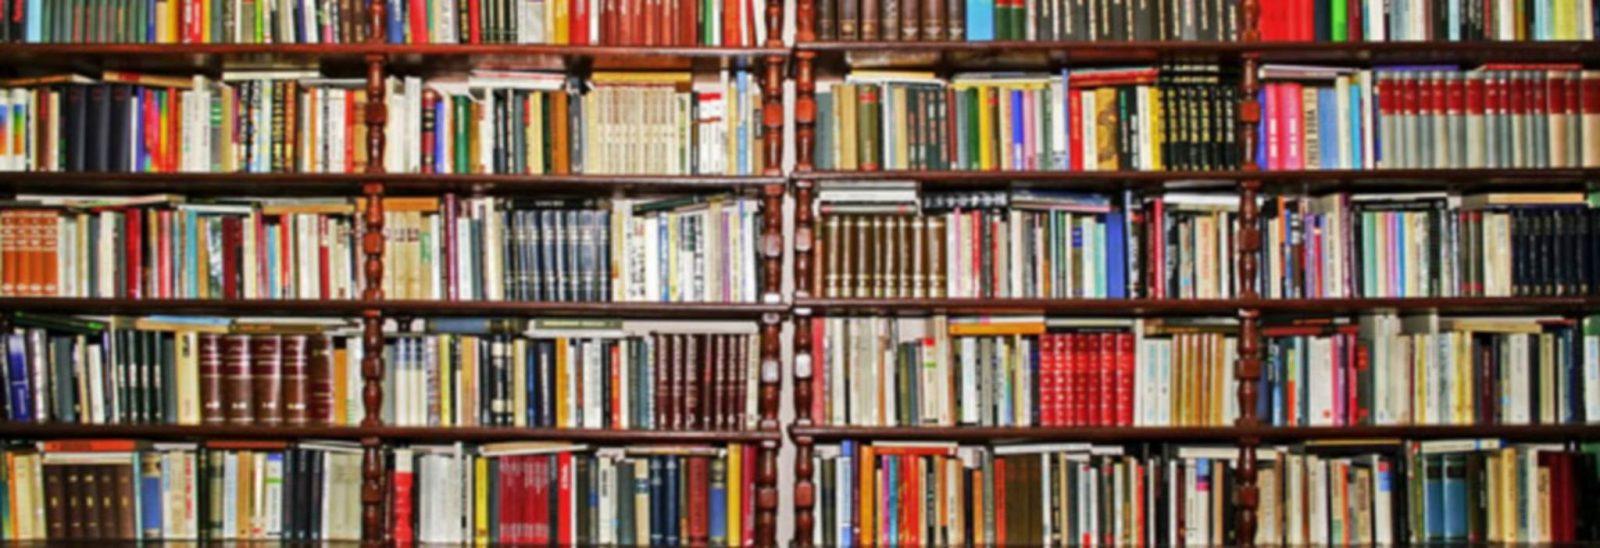 Bibliotheque-Arzal-Damgan la roche bernard tourisme